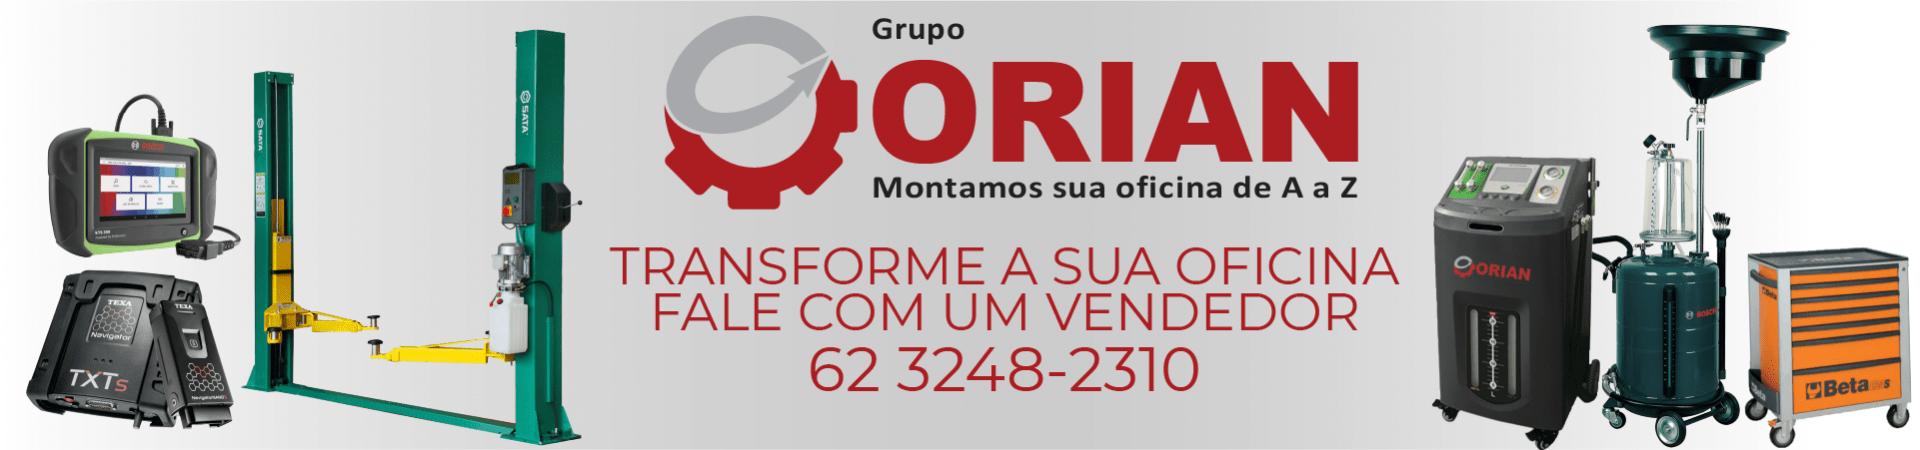 OFICINADEAAZ-25/01/2021-3